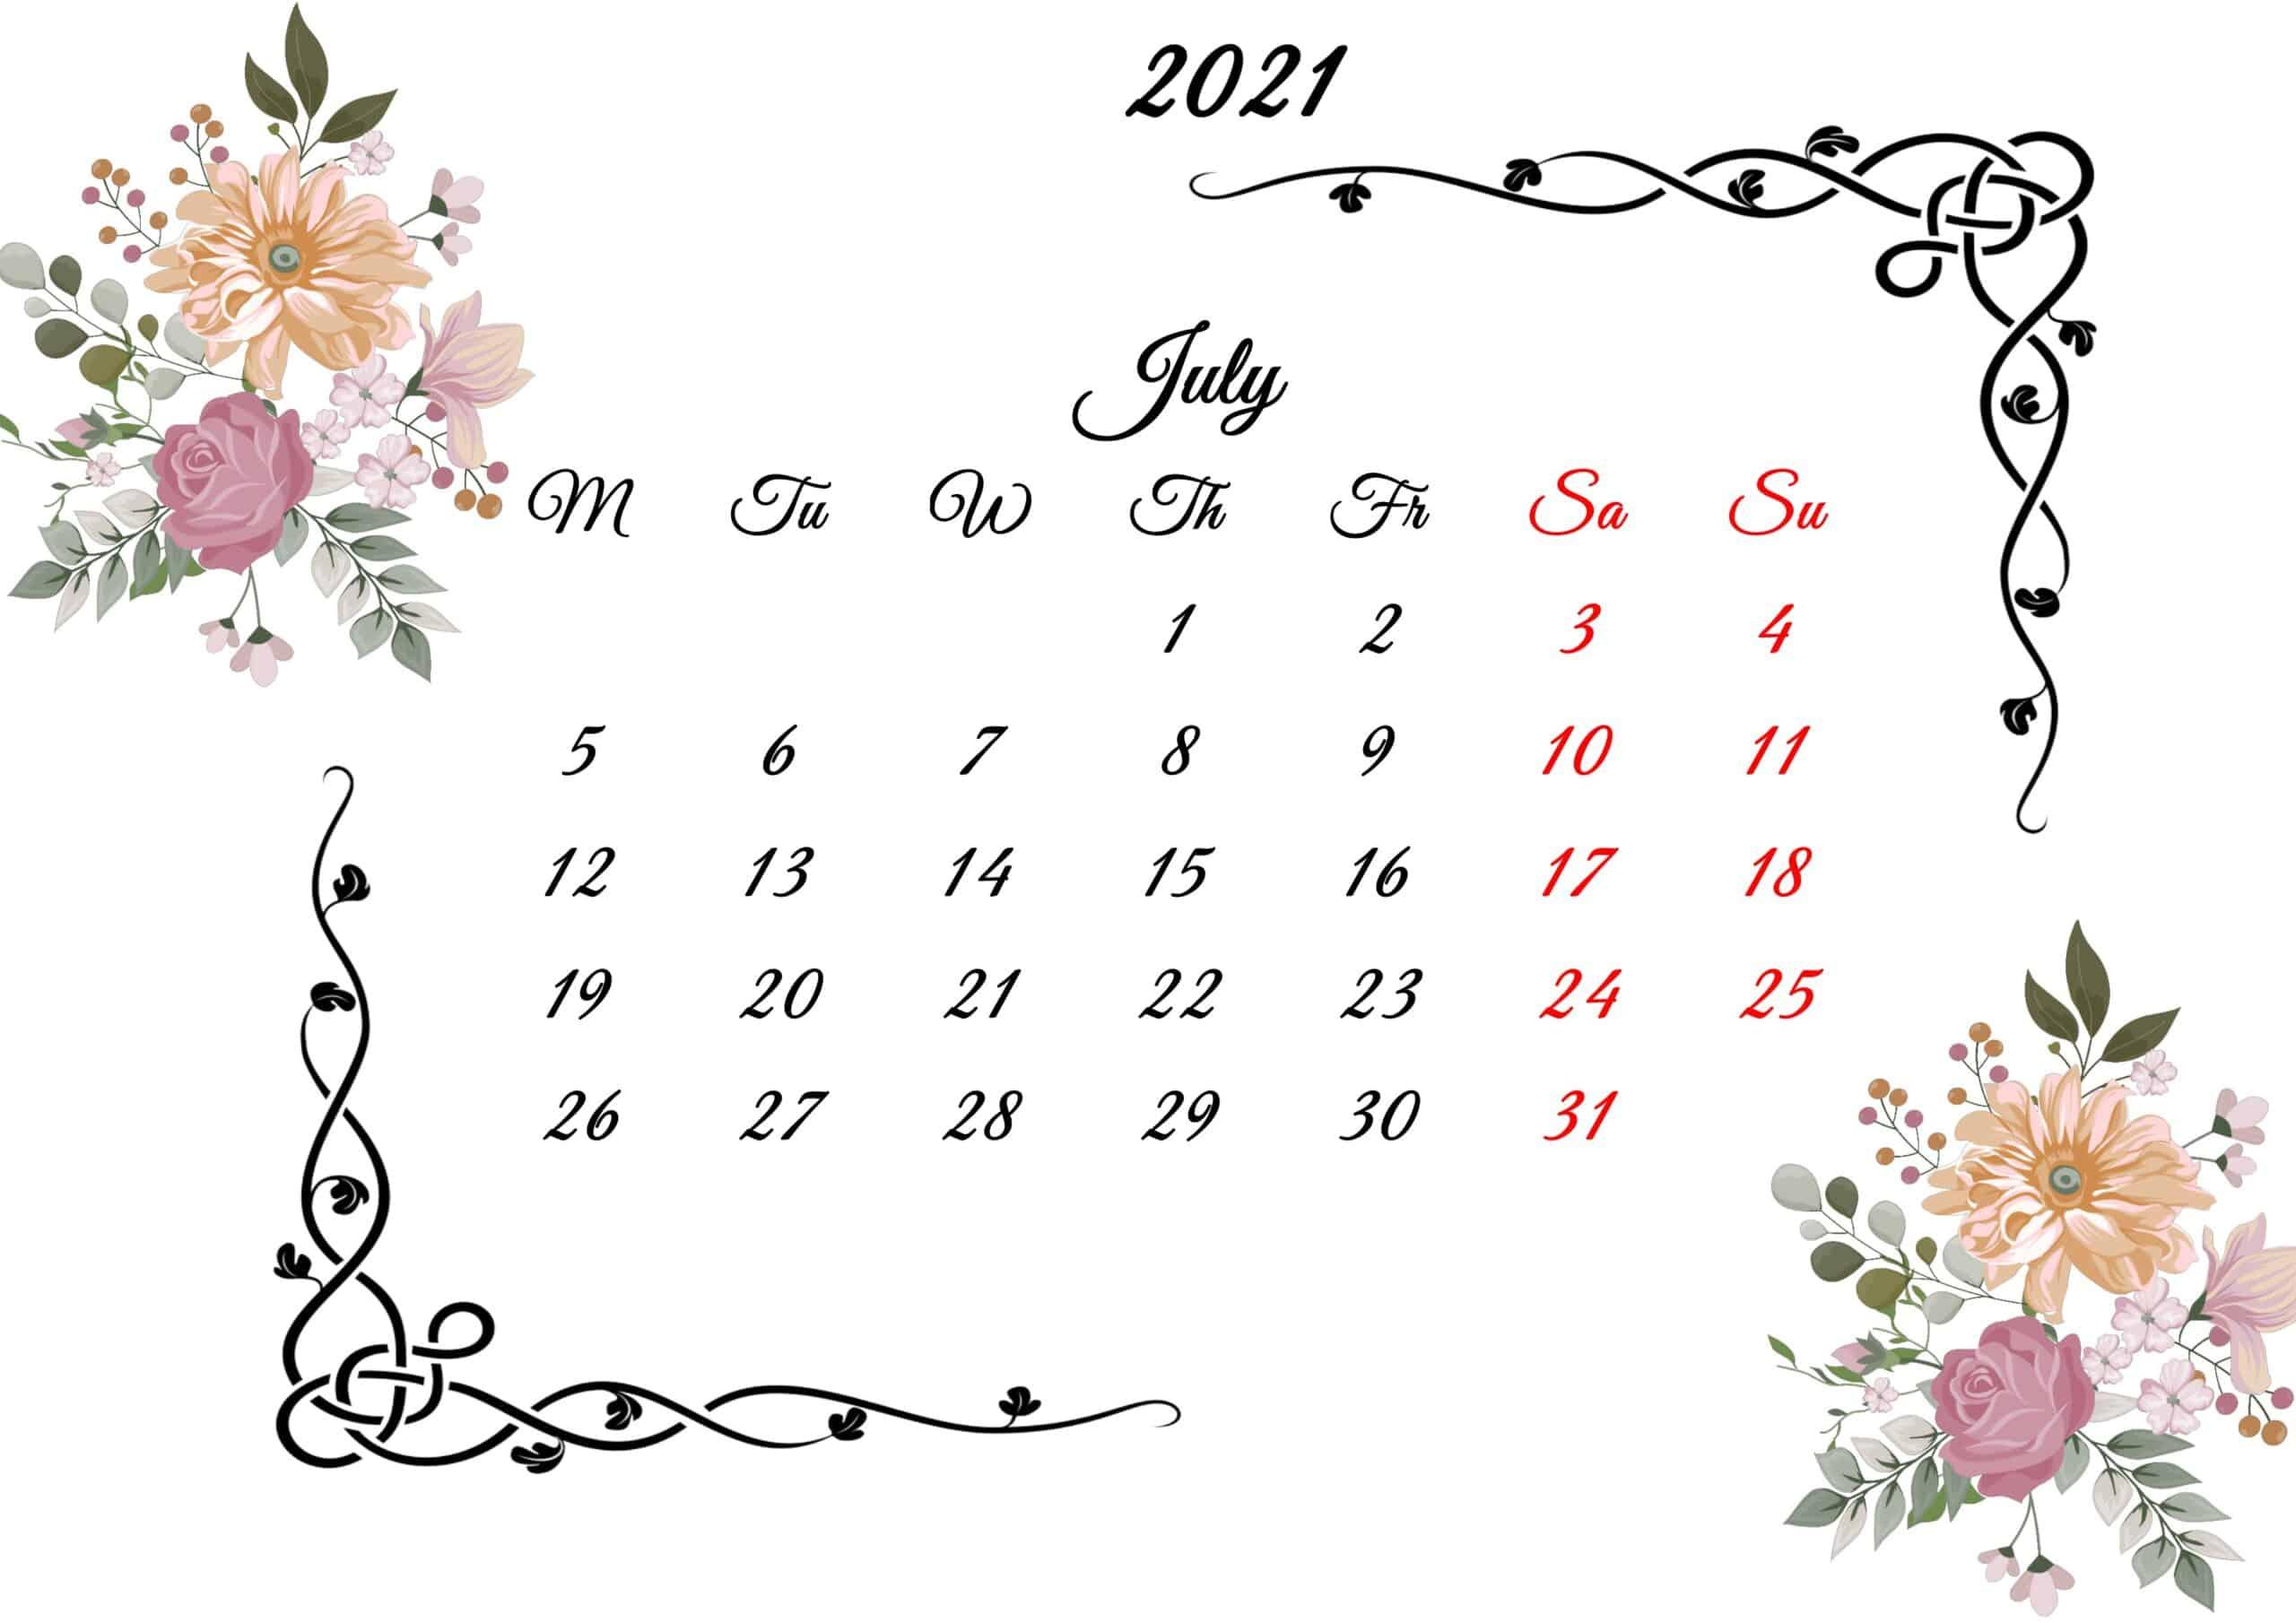 July Calendar 2021 Printable